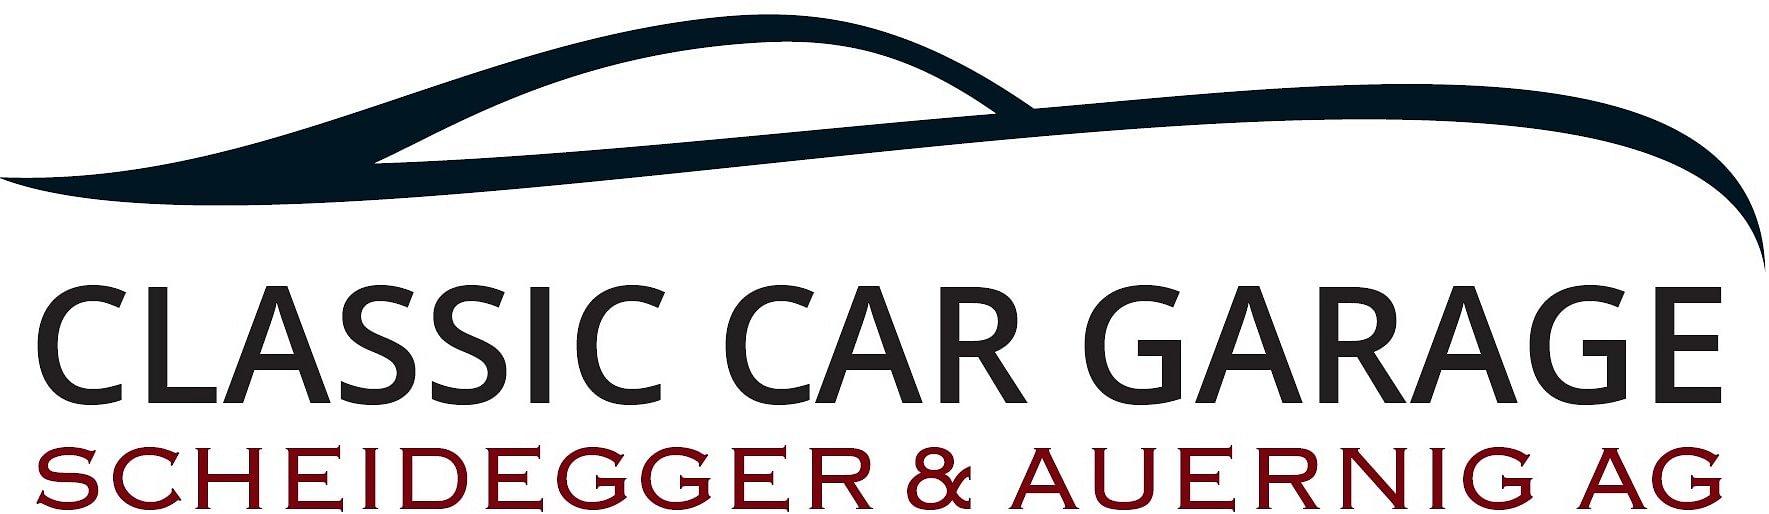 Classic Car Garage Scheidegger & Auernig AG